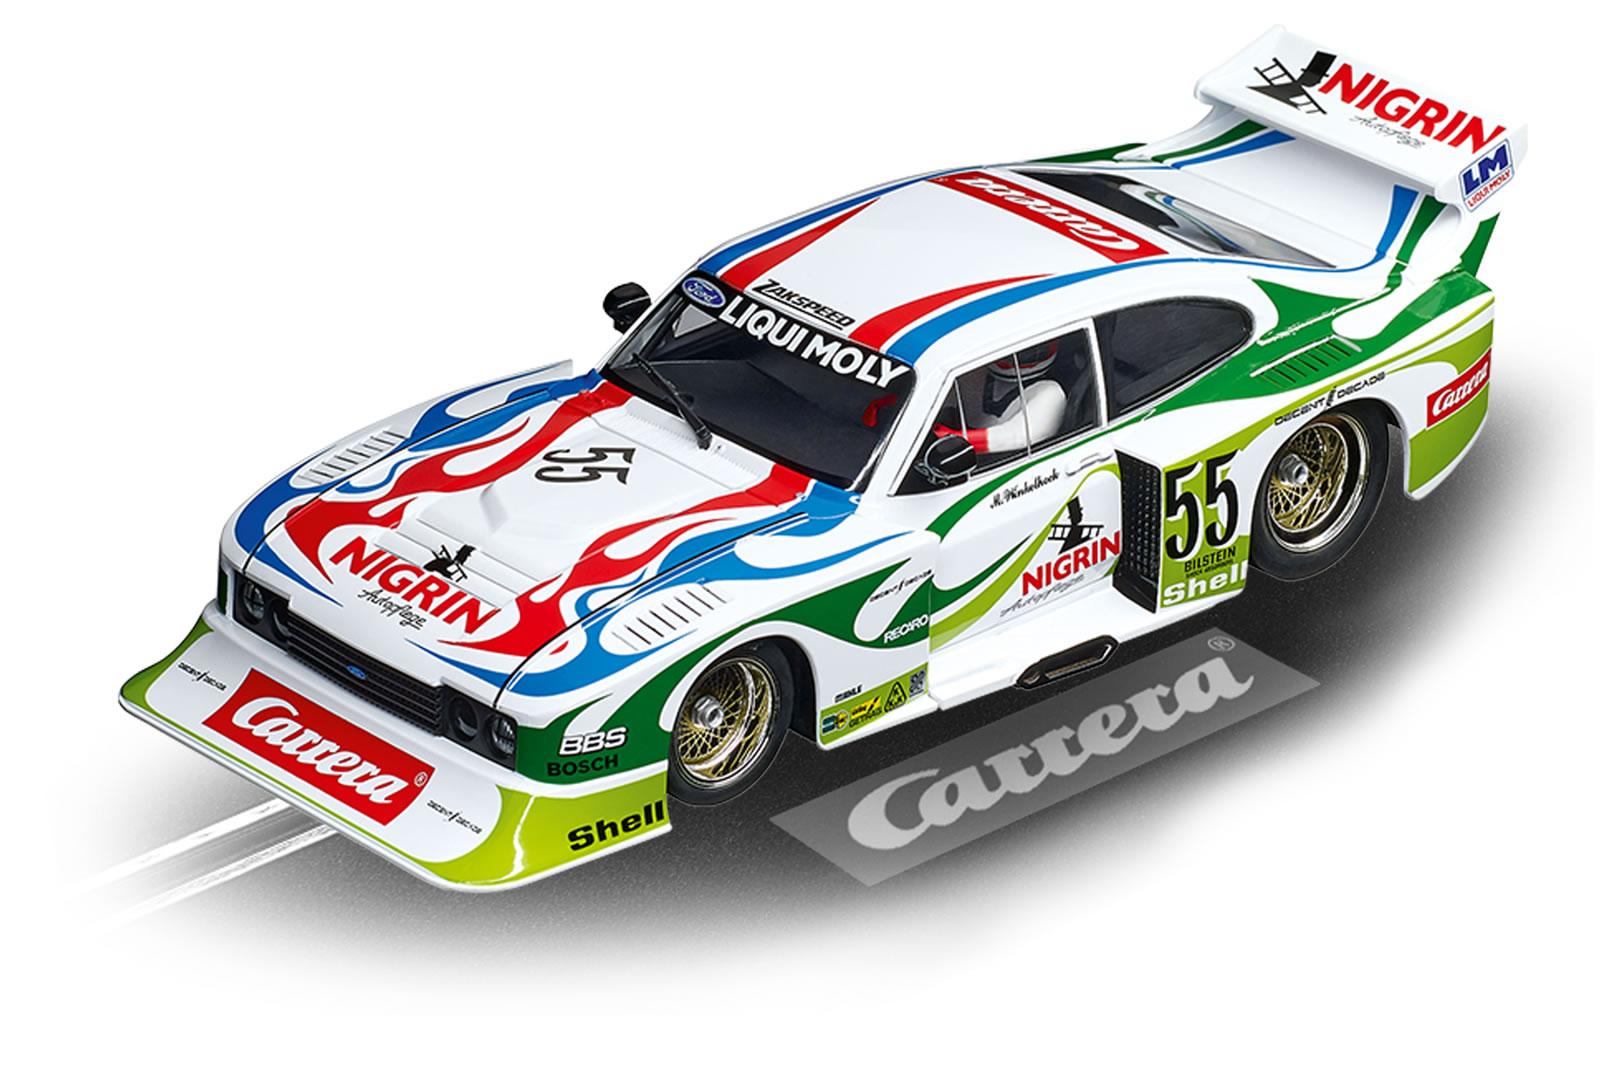 Ford Capri Zakspeed Turbo Liqui Moly Equipe #55